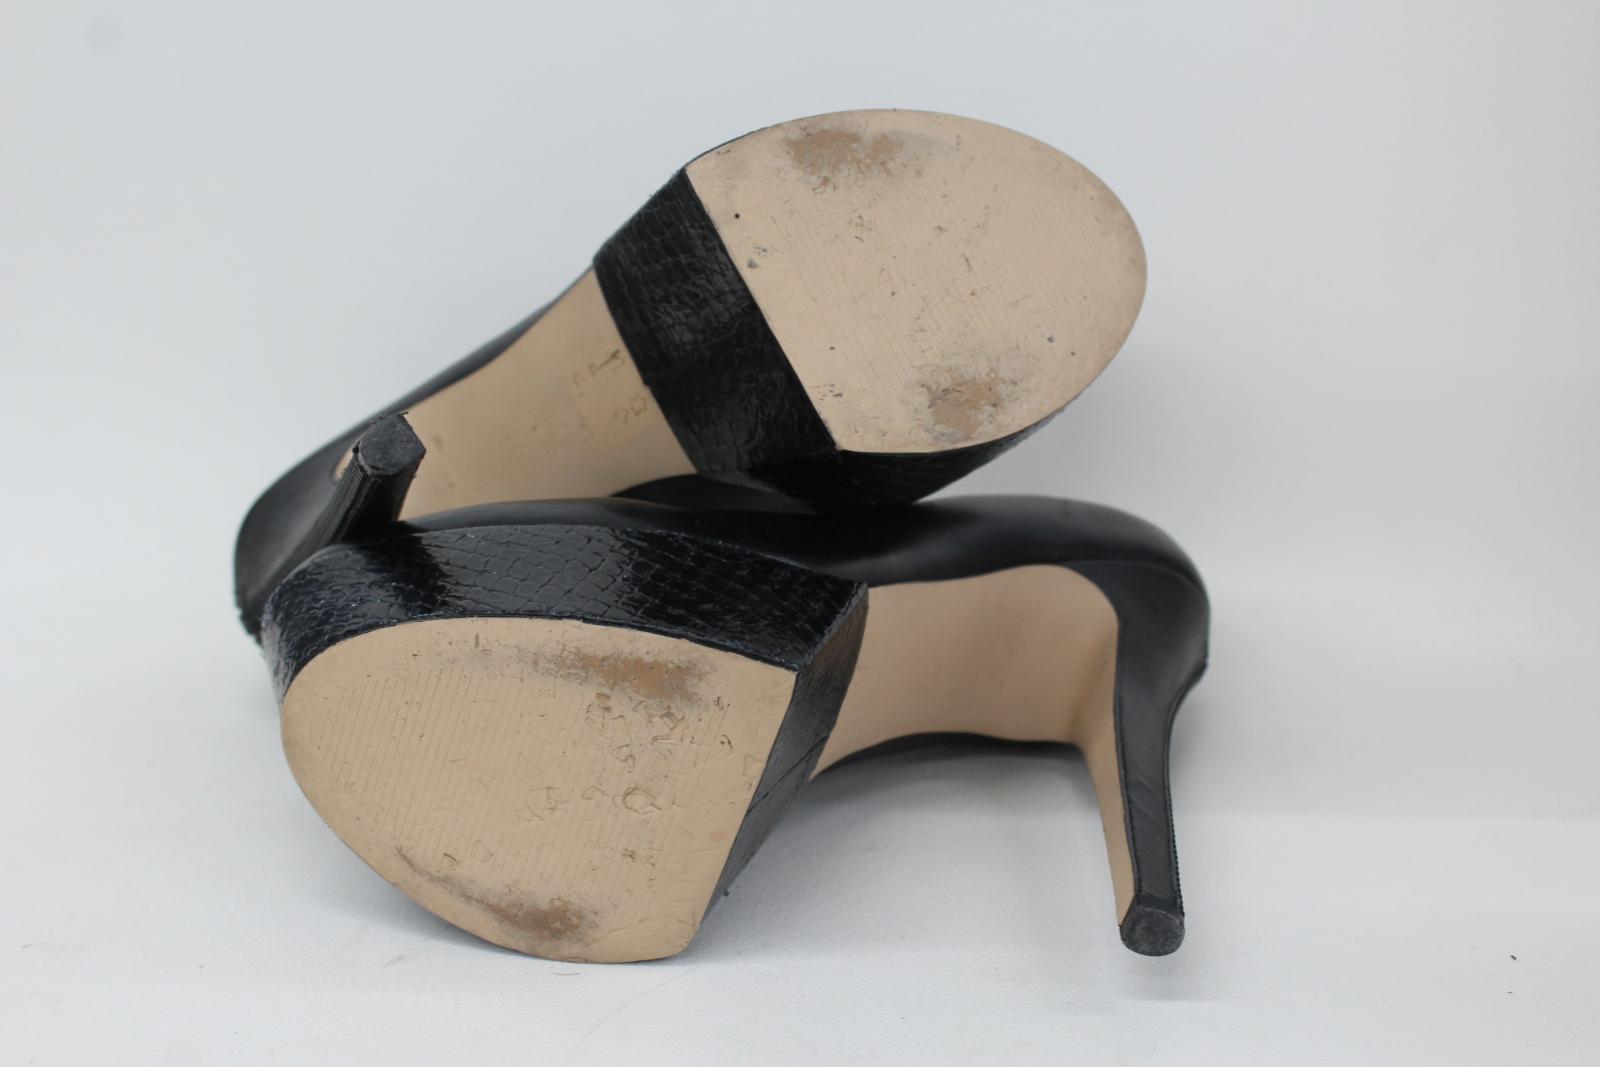 CARVELA KURT GEIGER Ladies Black Leather High High High Heeled Court shoes UK7 EU40 a99f36